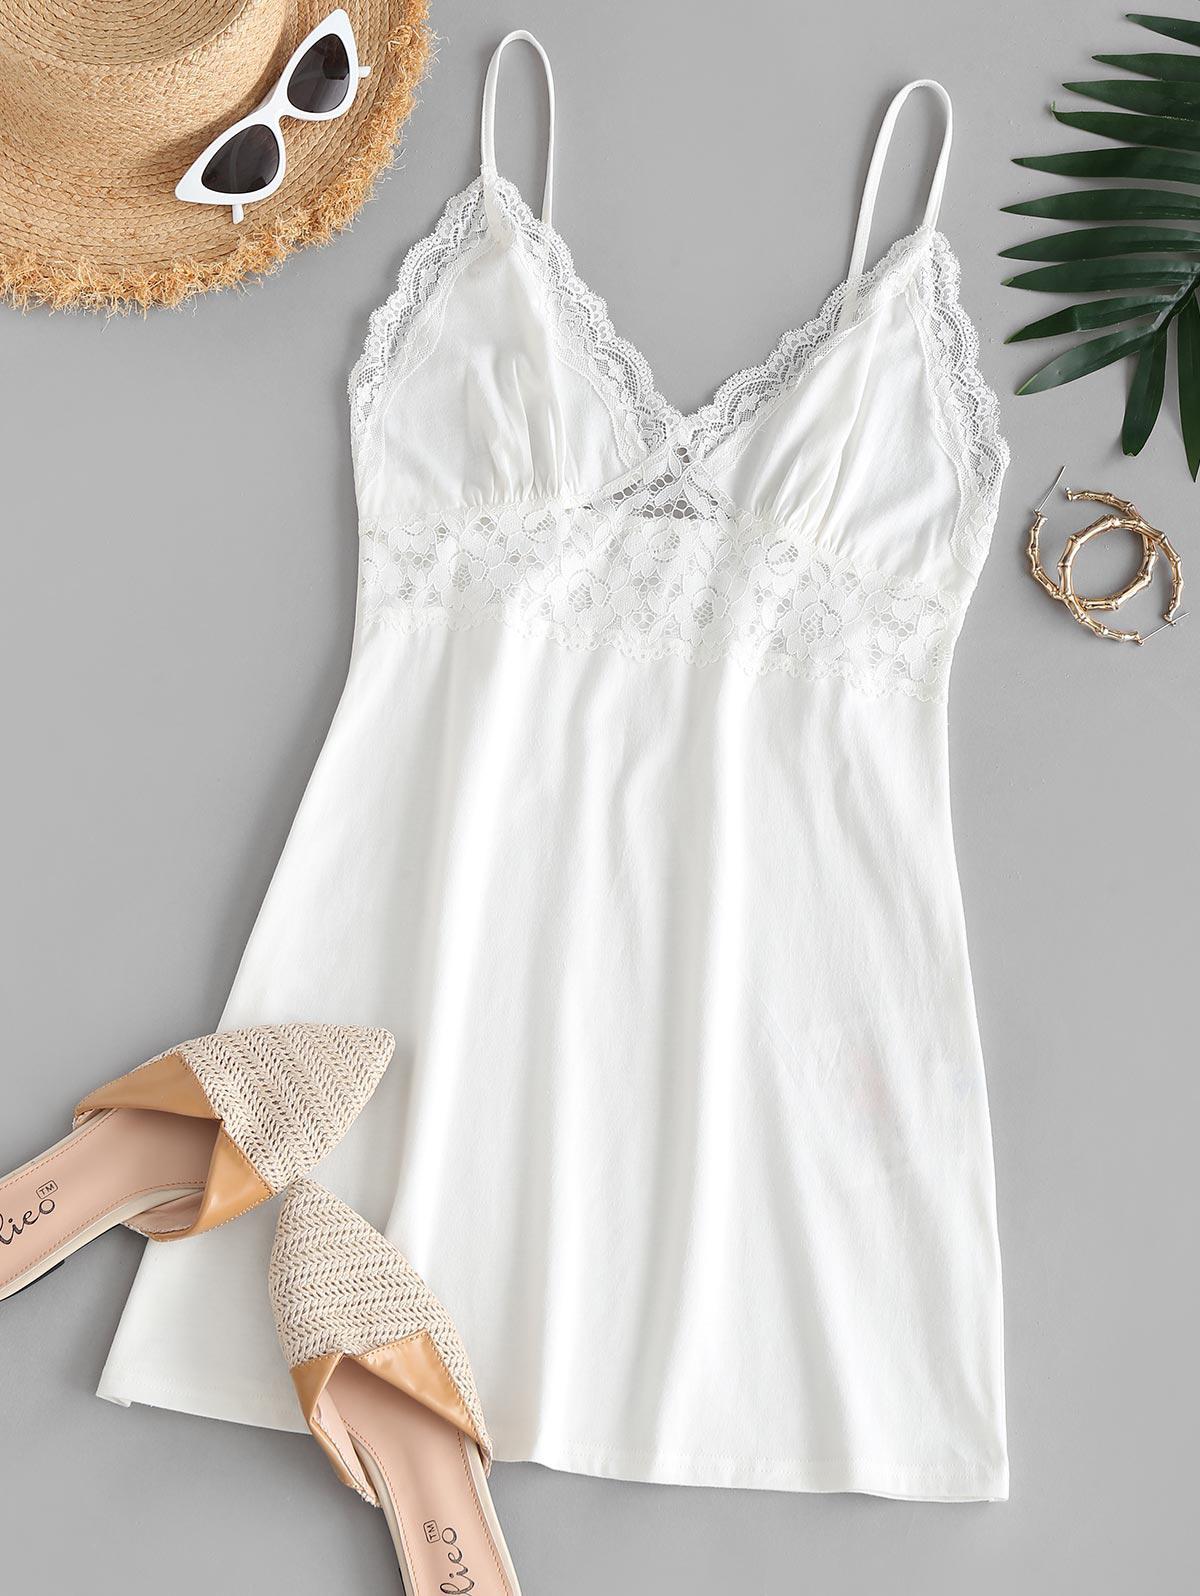 ZAFUL Lace Panel Cami Sleepwear Dress